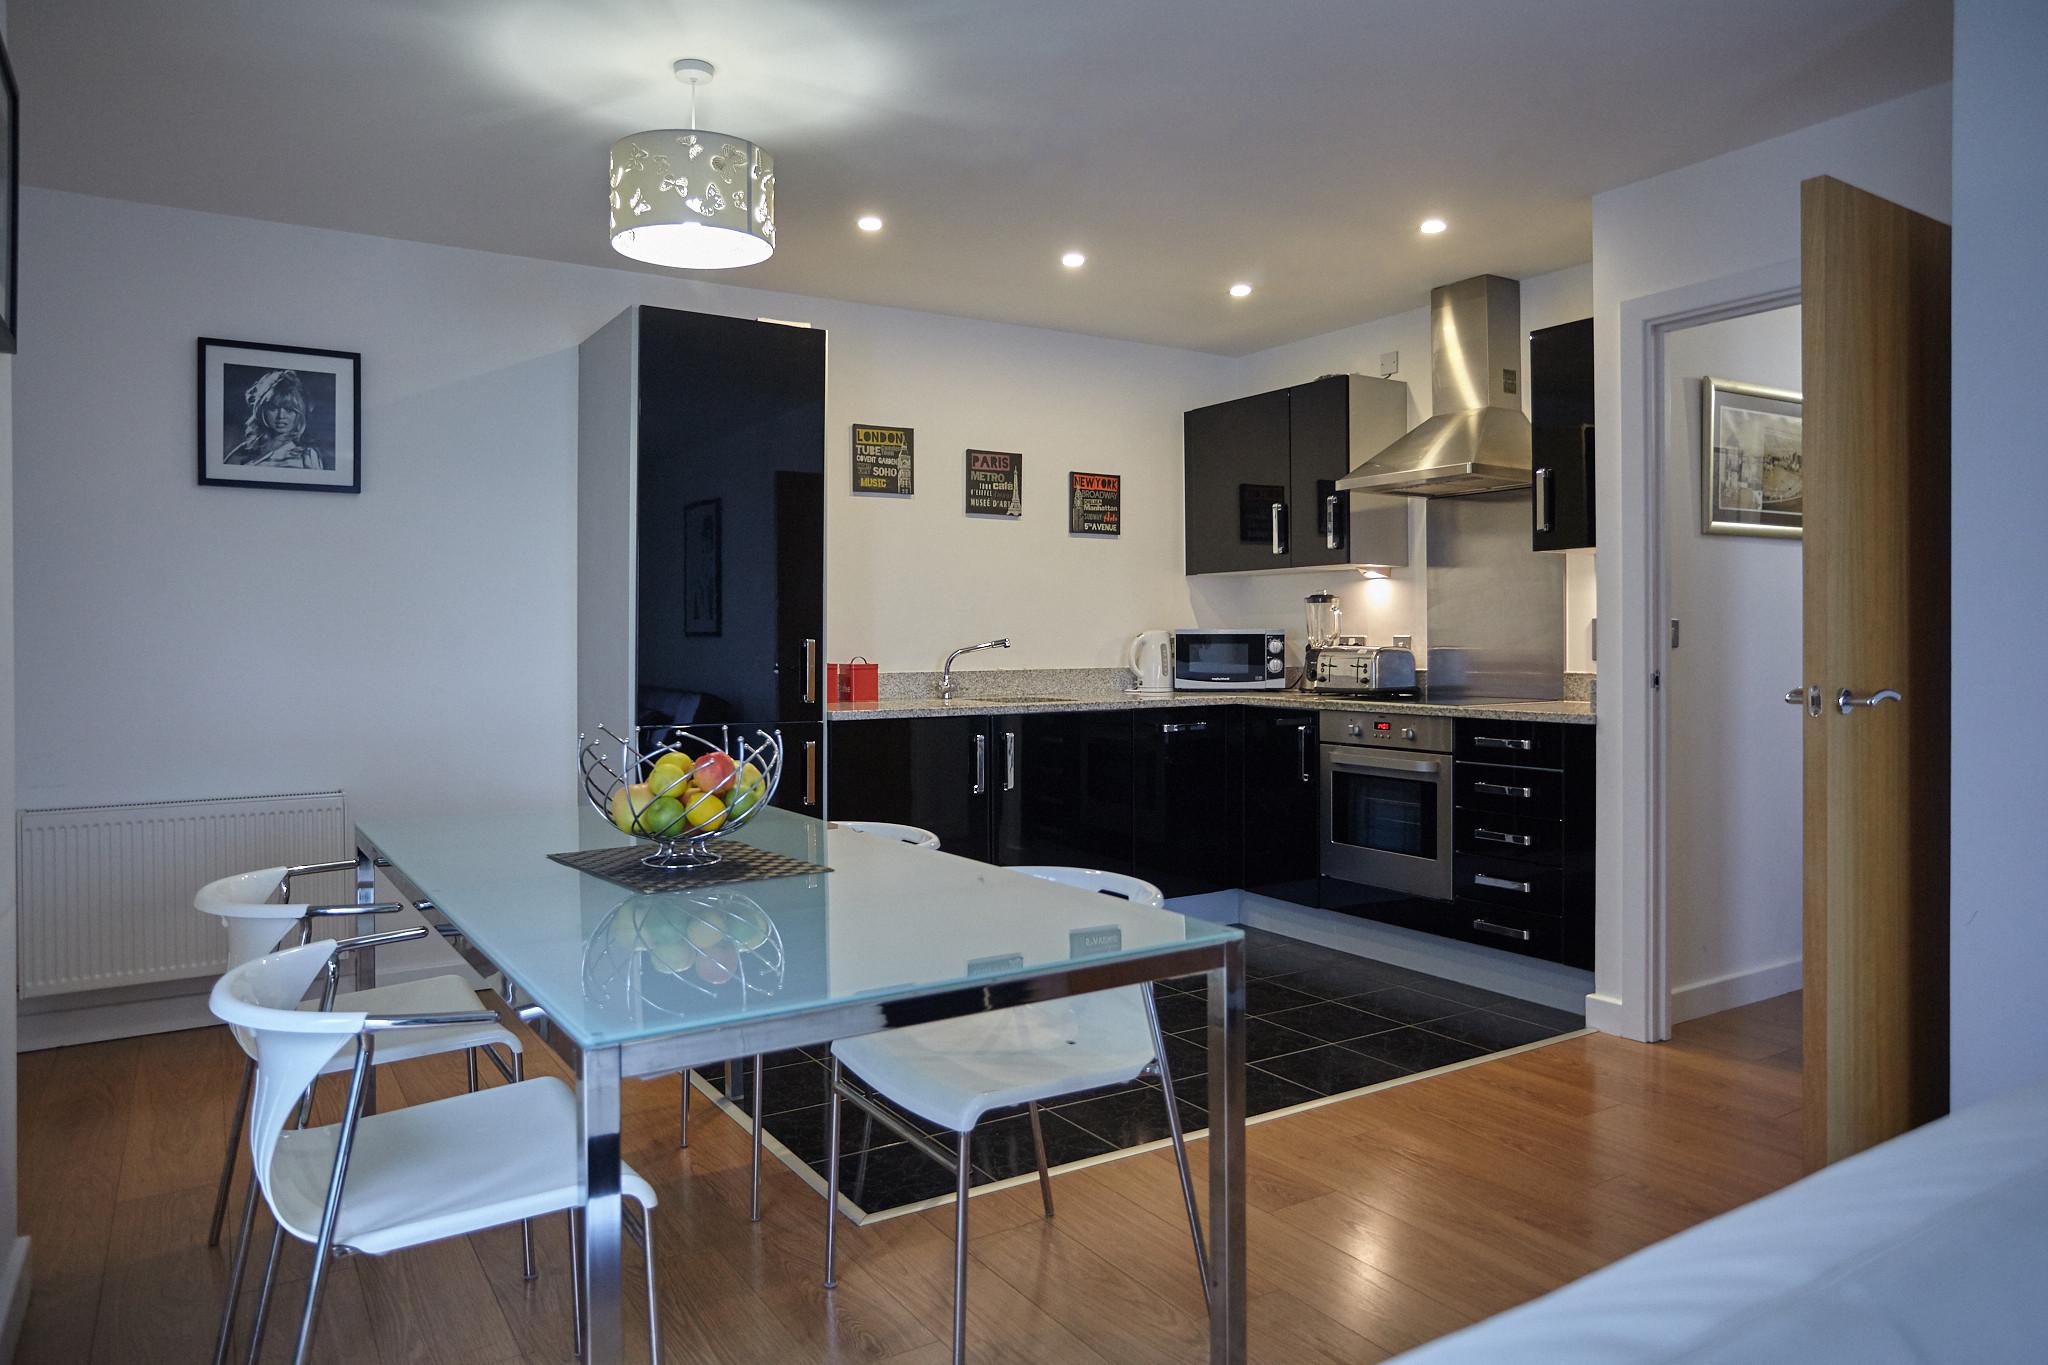 Ferienwohnung für 8 Personen ca 80 m² in London Borough of Greenwich England South East England